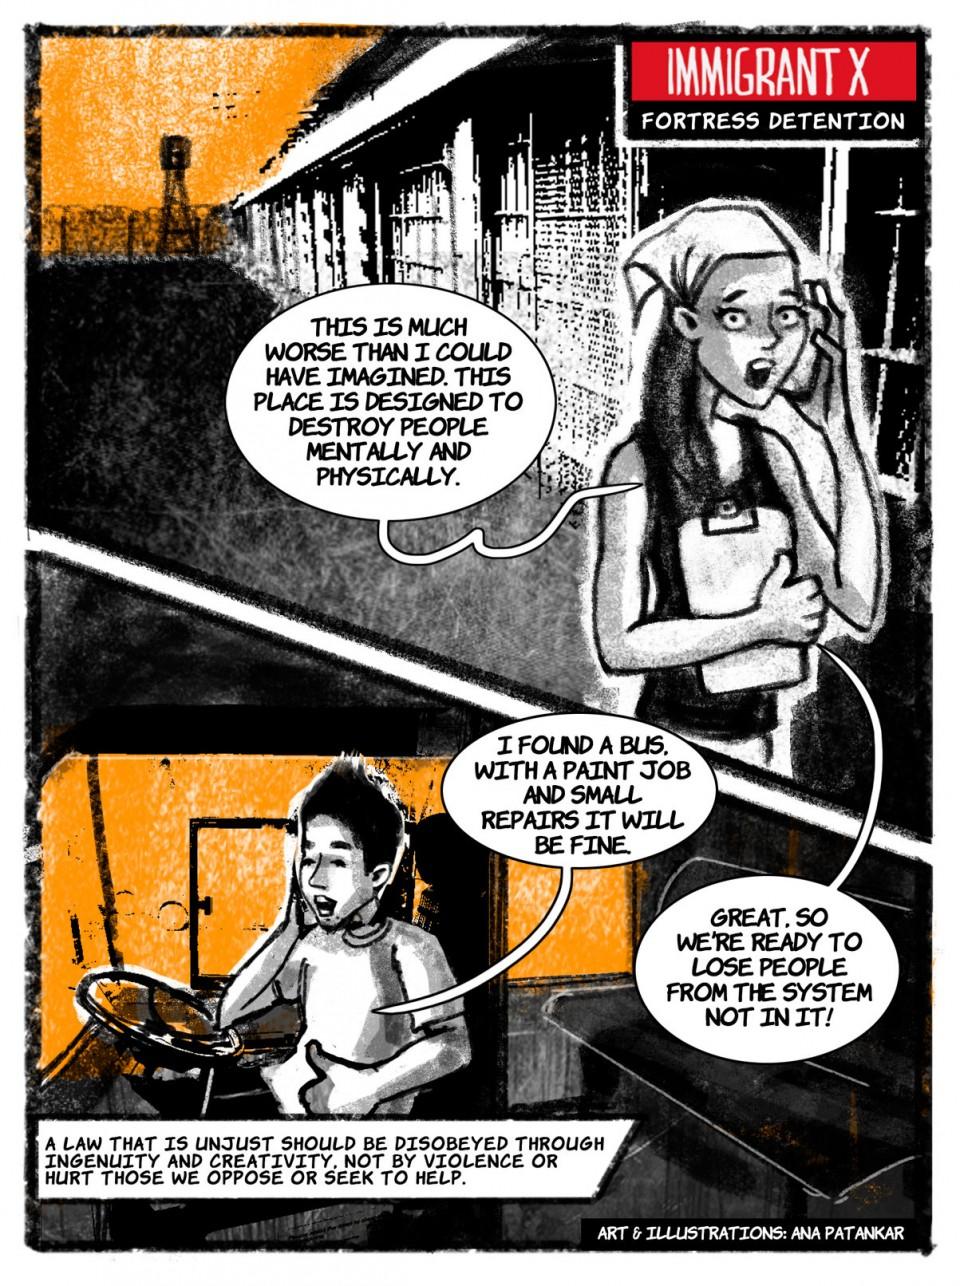 rsz_immigrantx-story4-frame9